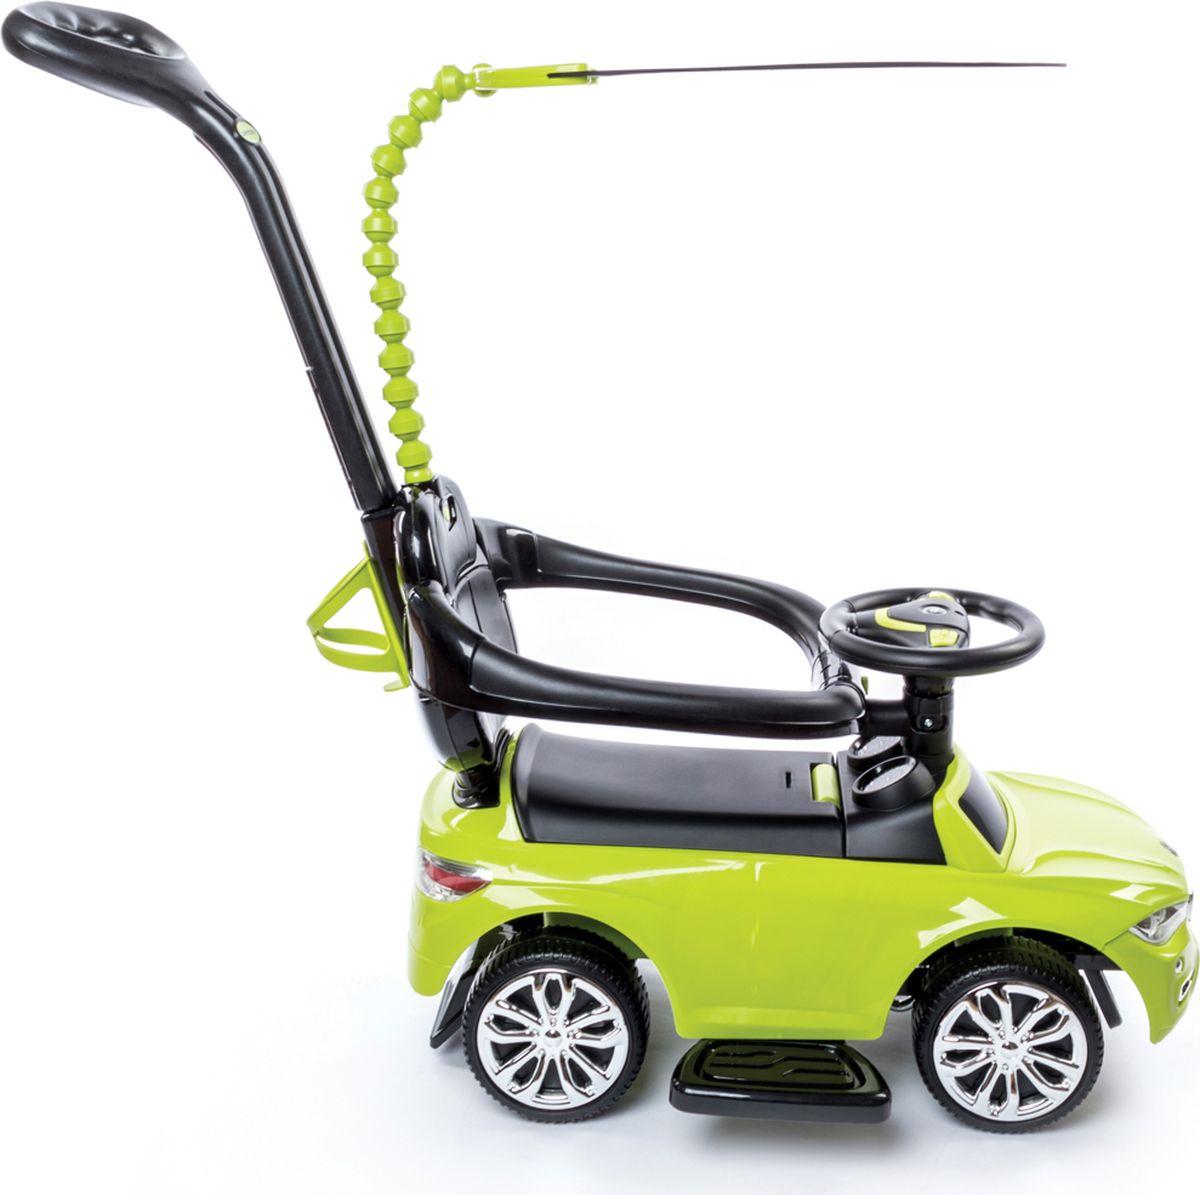 Happy Baby Машина-каталка Jeepsy цвет зеленый -  Каталки, понициклы